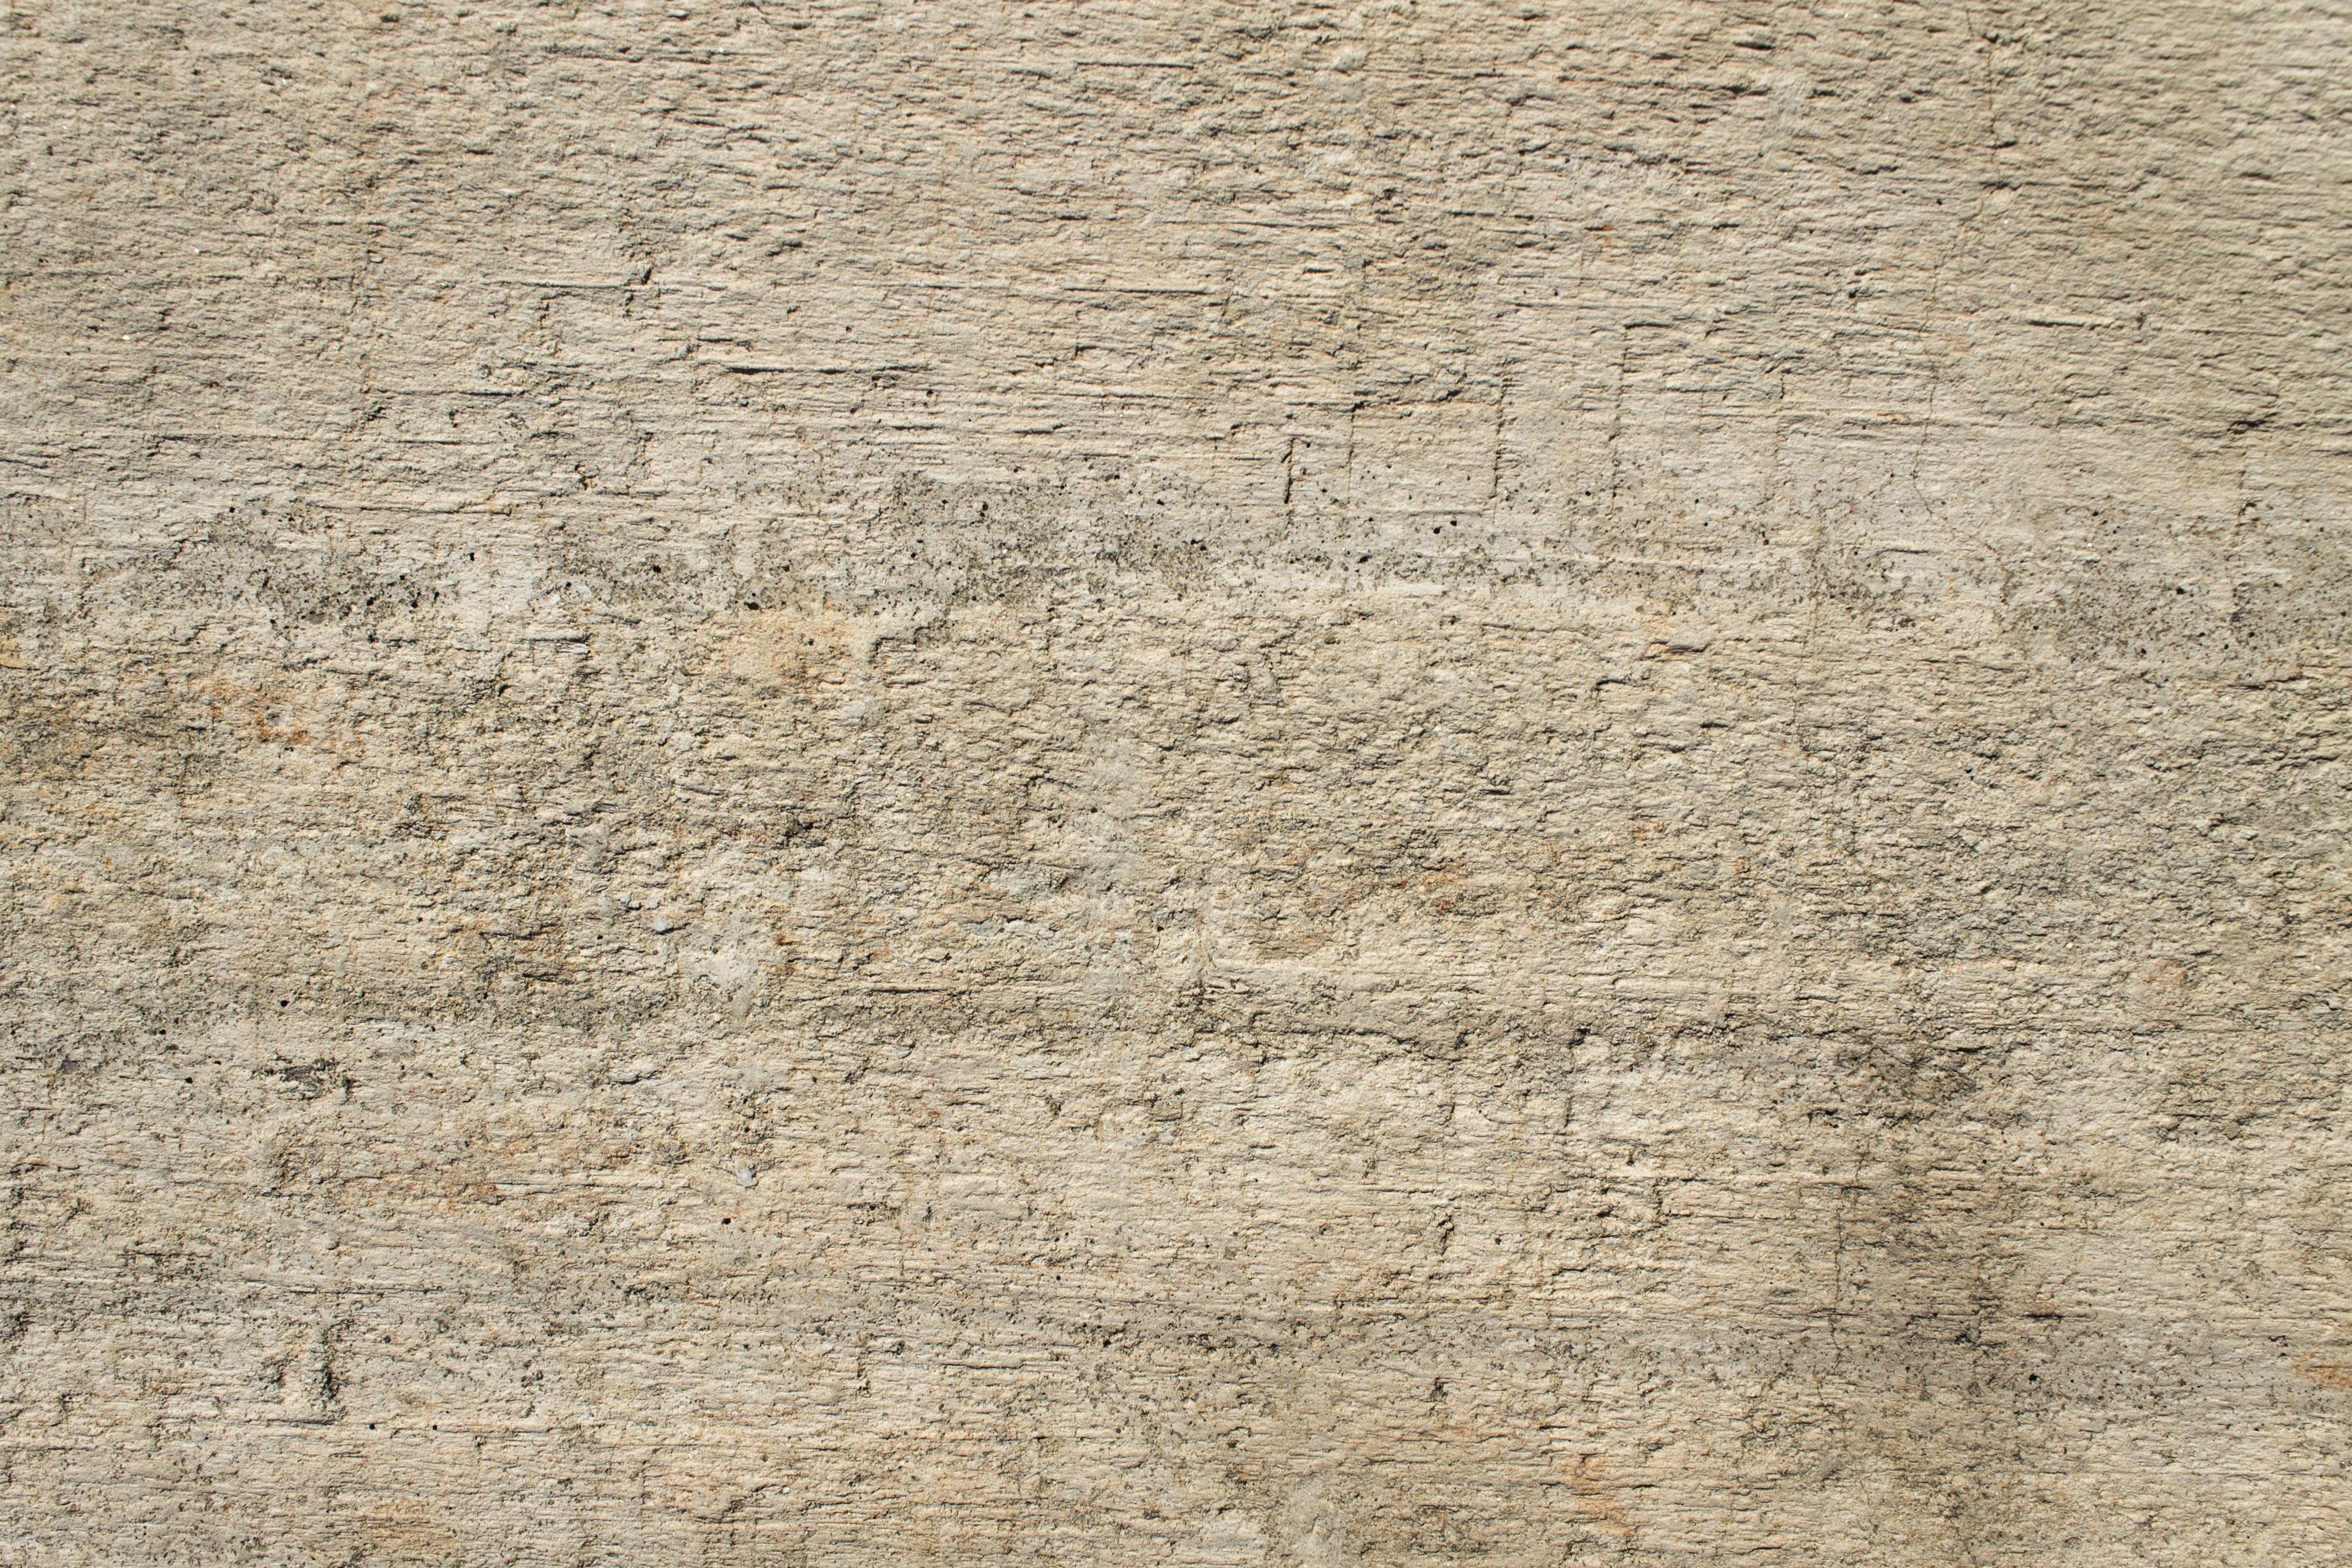 Fotos gratis textura piso pared suelo azulejo exterior Pared